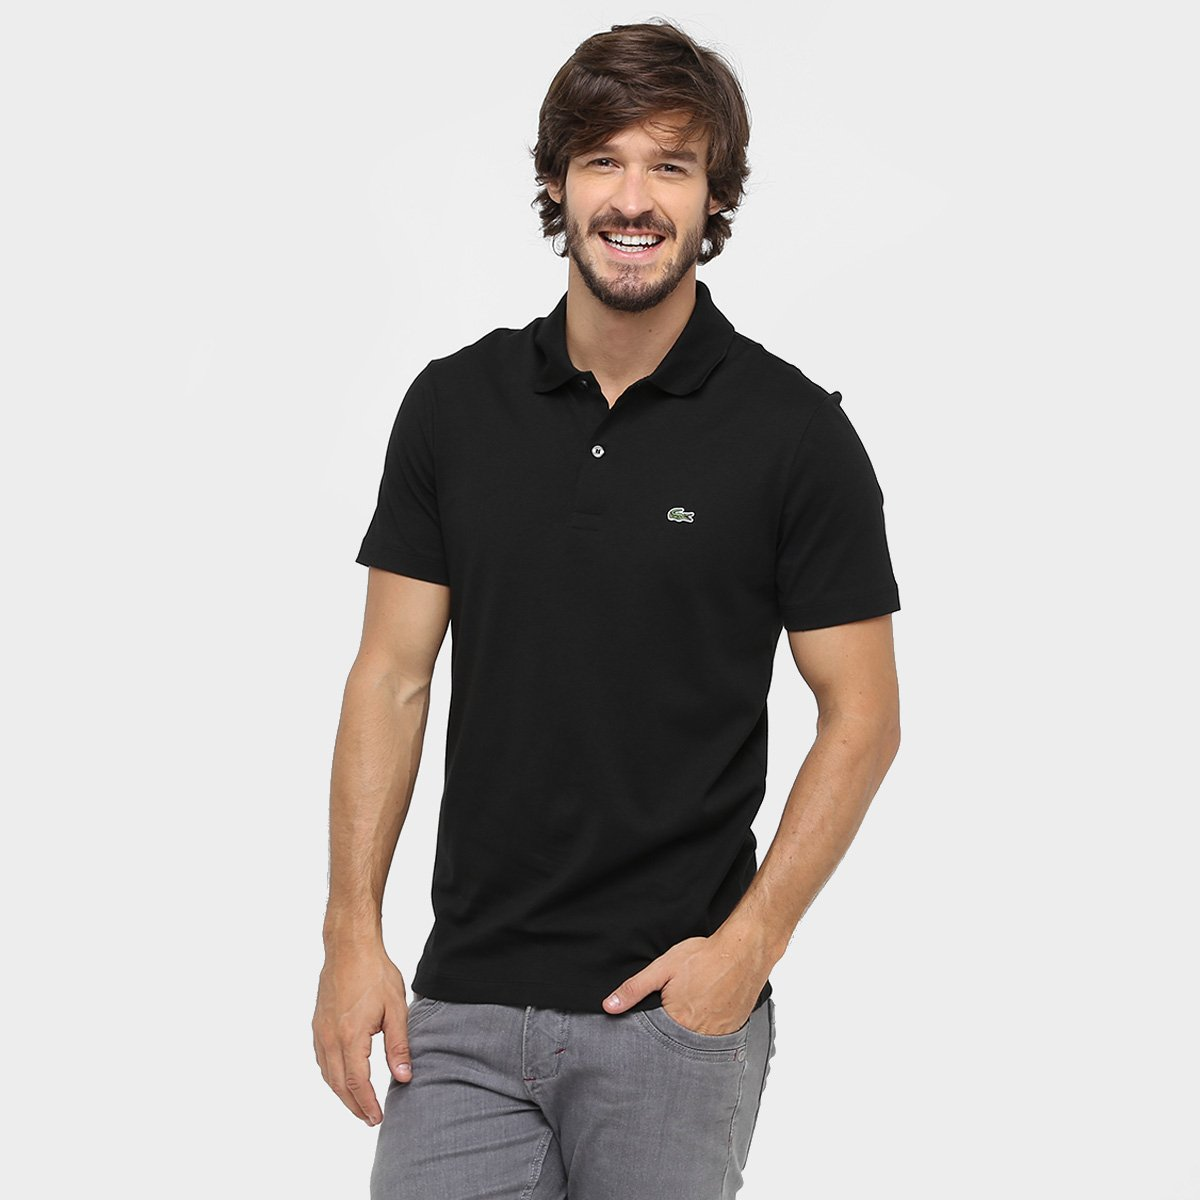 da119cbe4ac87 Camisa Polo Lacoste Malha Original Fit Masculina